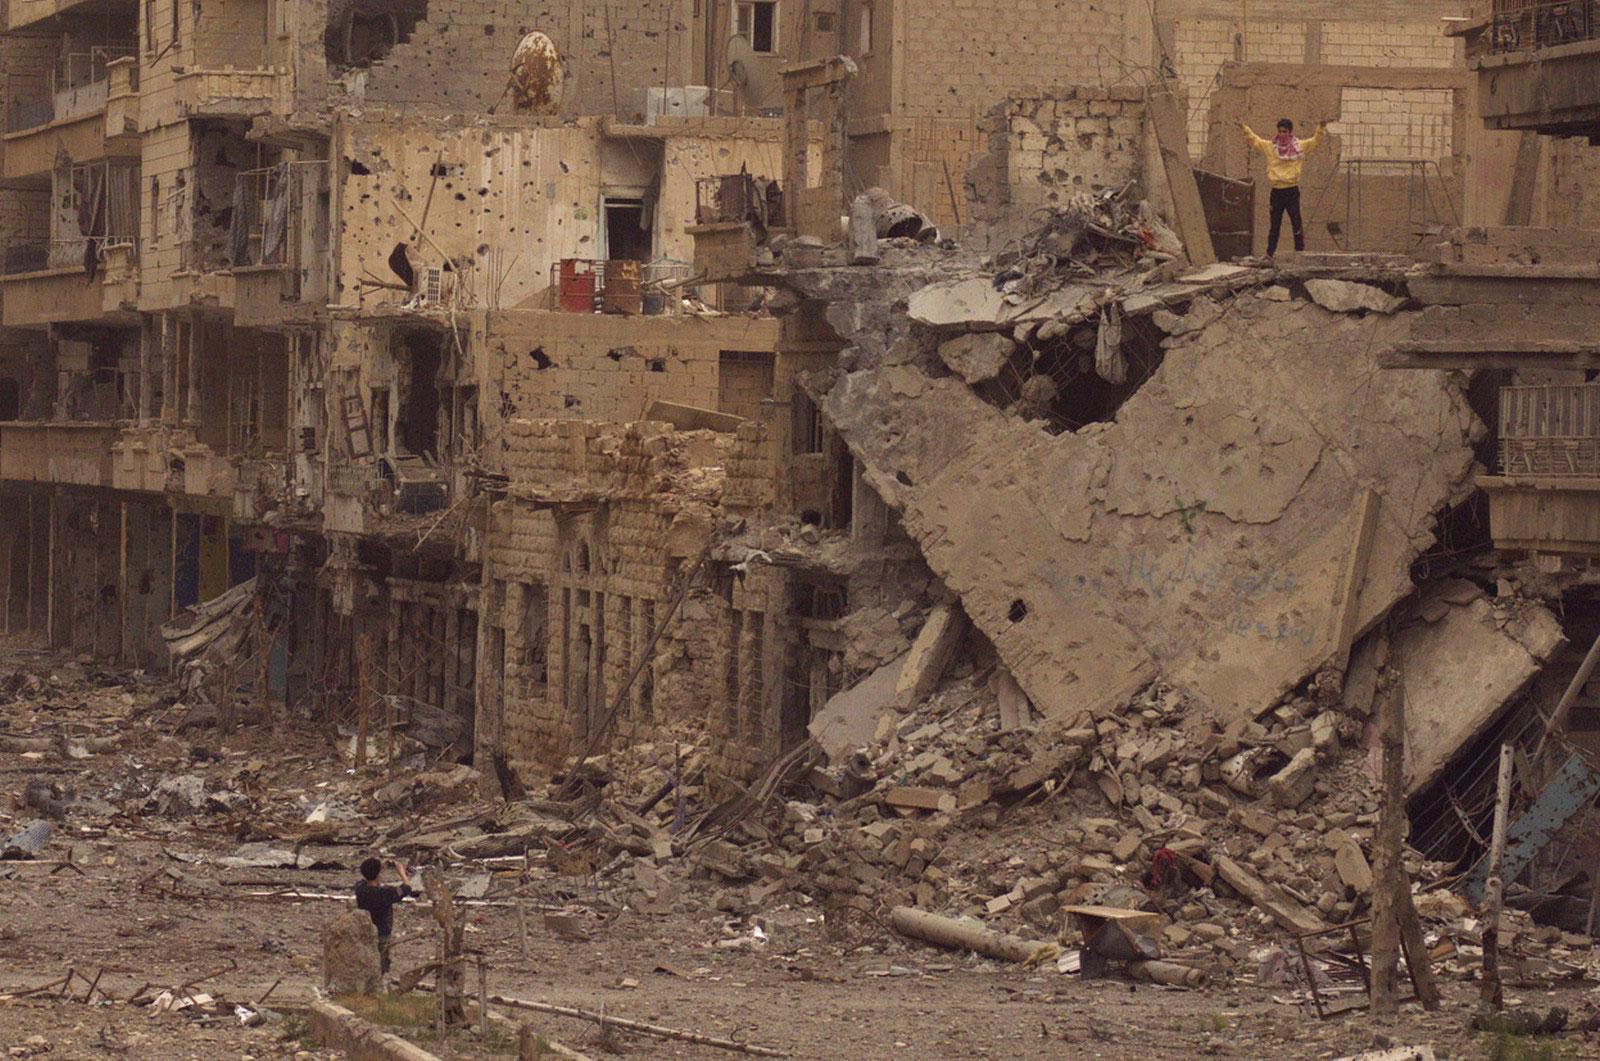 на руинах Дейр-эз-Зора, фотография